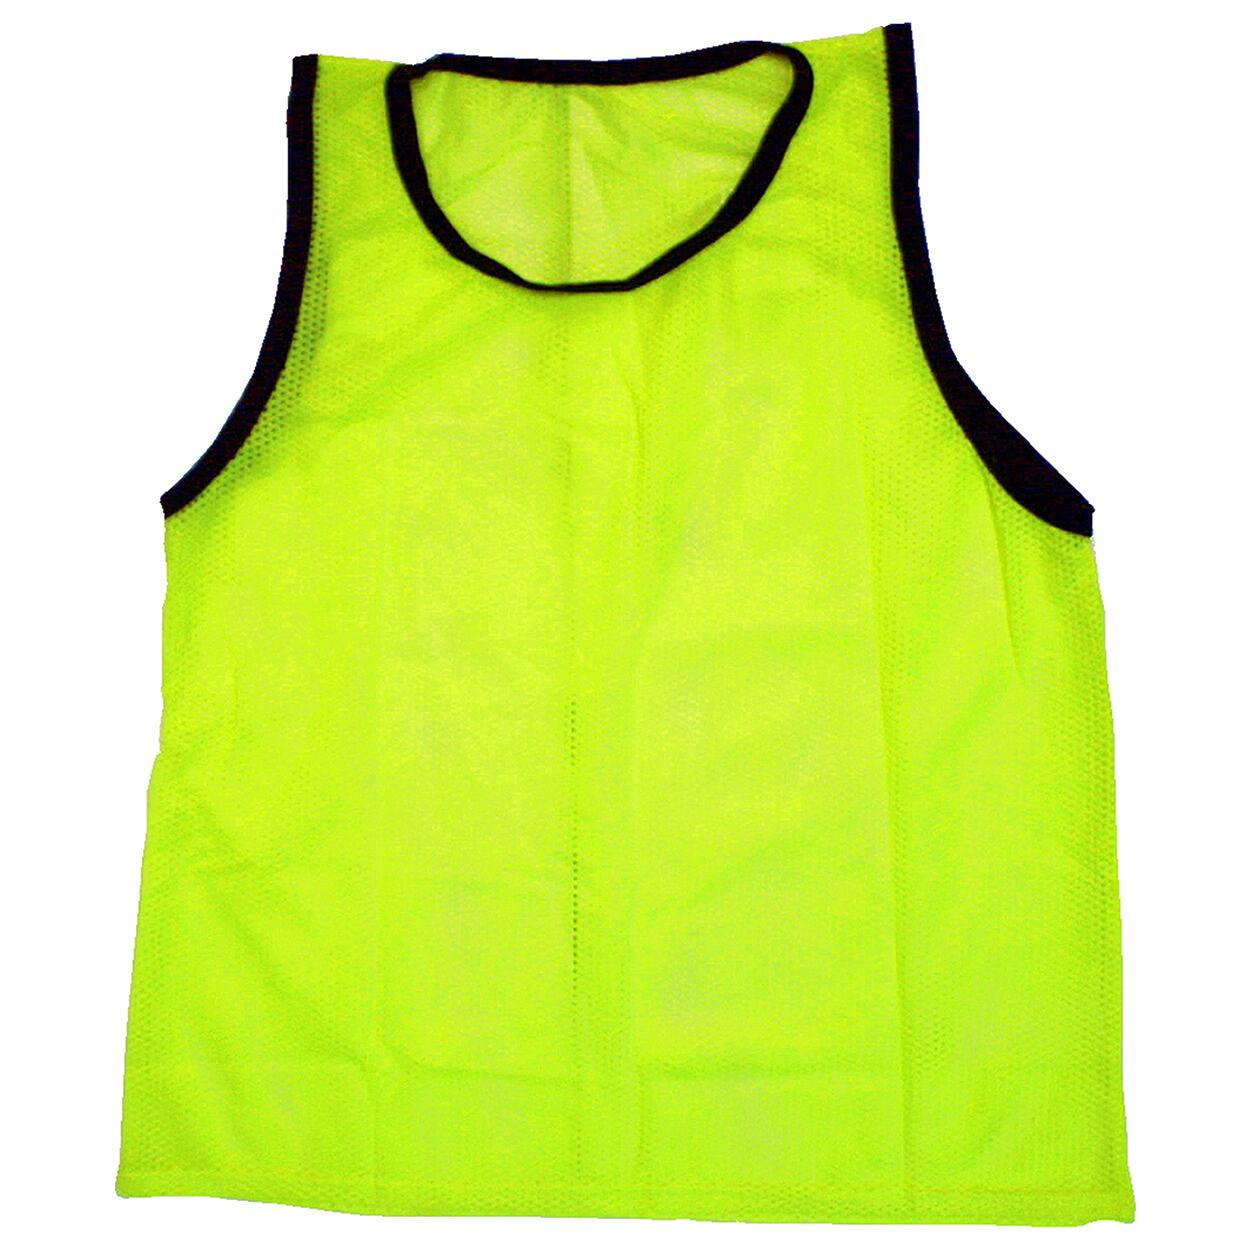 Adult Yellow Scrimmage Training Vests Pinnie Uniform